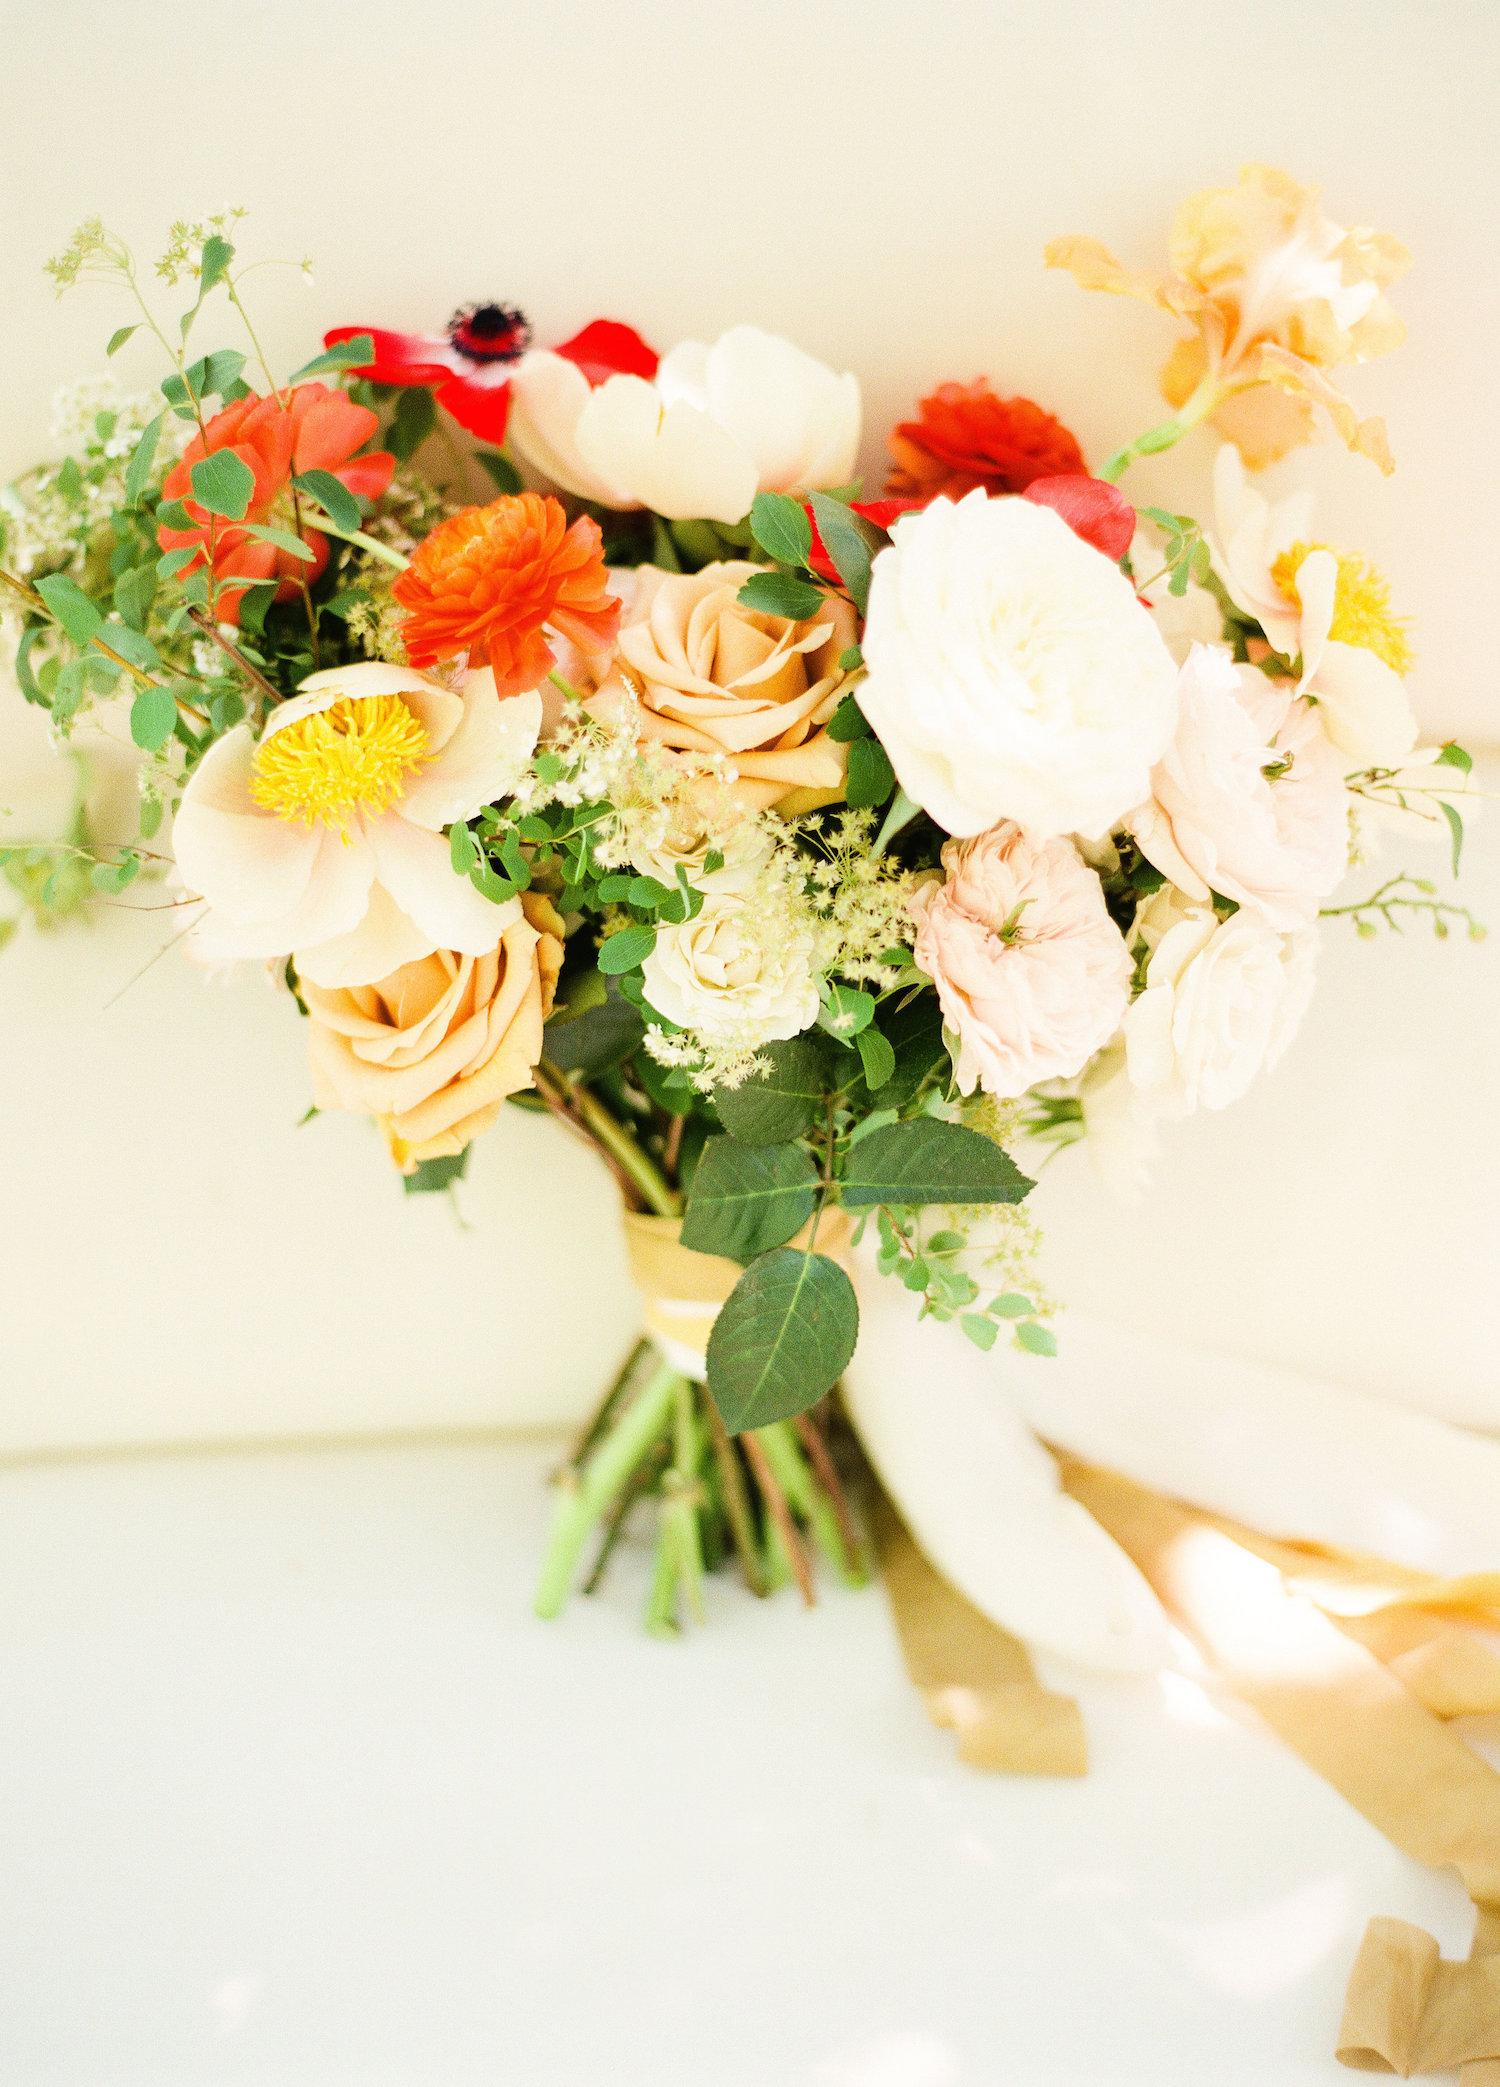 Morning Glow - Full Aperture Floral & Lindsay Madden Photography 46.jpeg